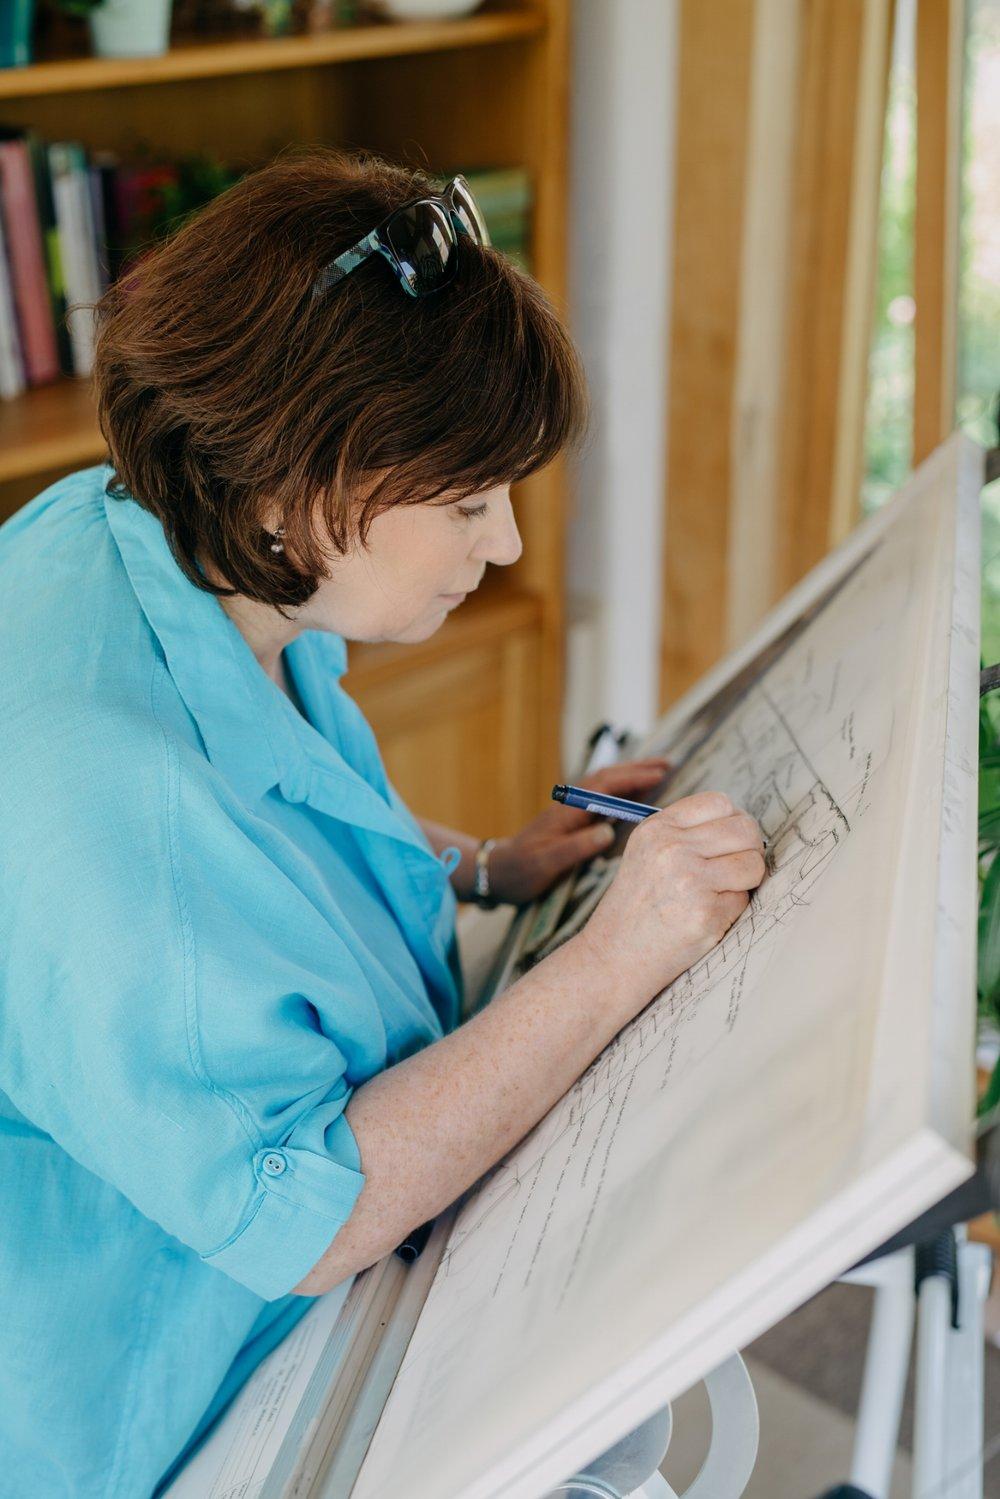 Sarah Layton creating beautiful, sustainable and long-lasting planting designs